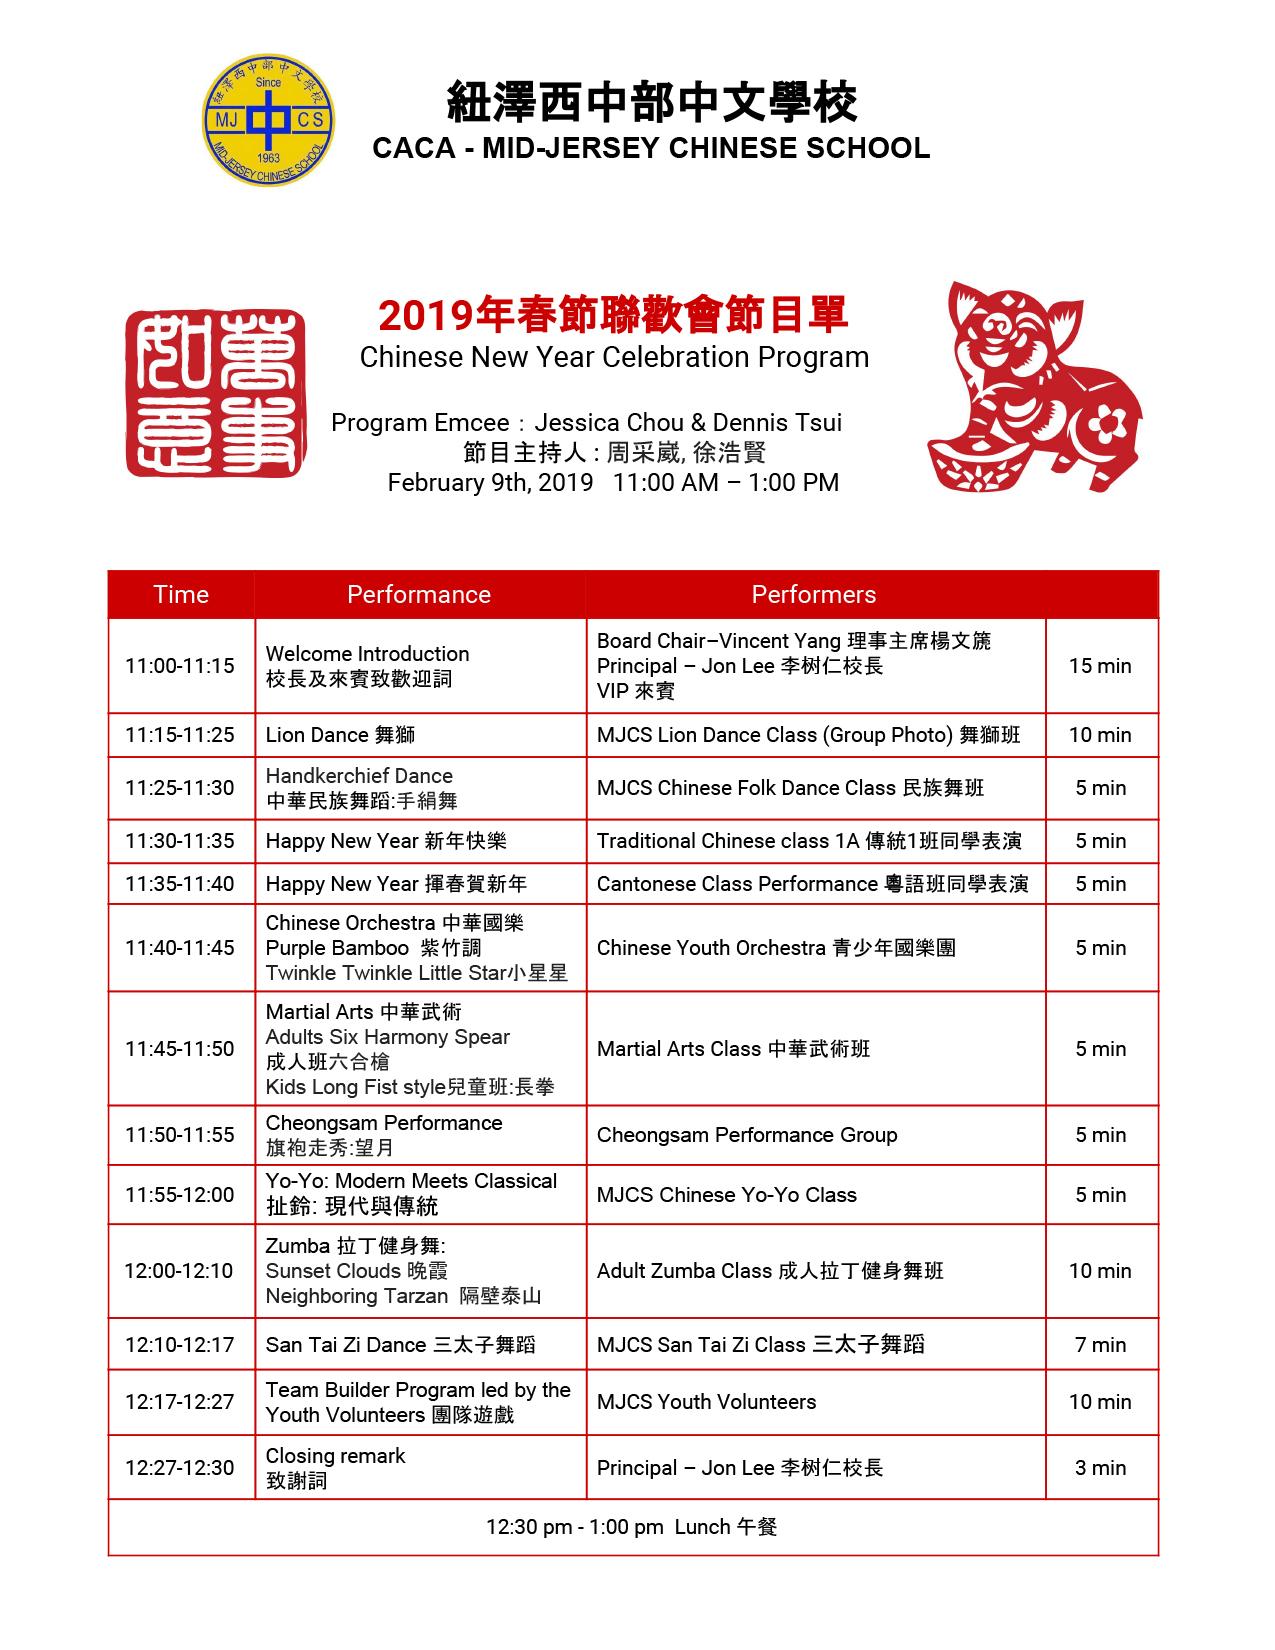 2017 CNY celebration Program.jpg